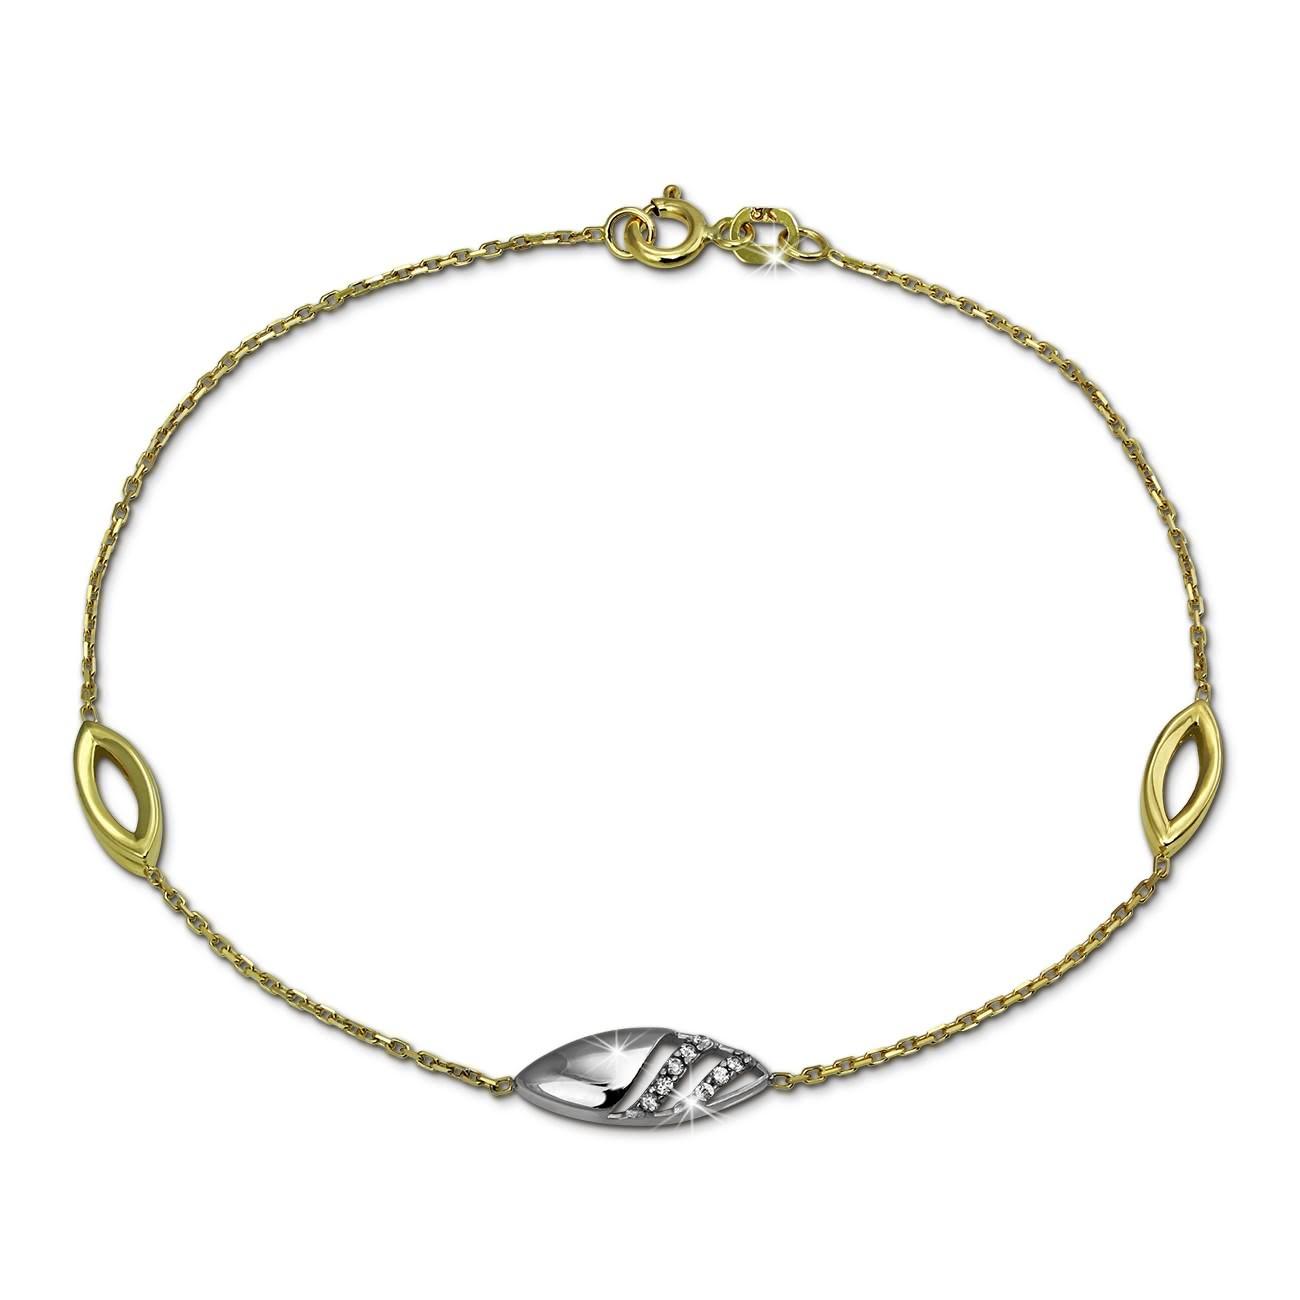 SilberDream Armband Glamour Zirkonia weiß 333 Gold 18,5cm 8 Karat GDA5018T